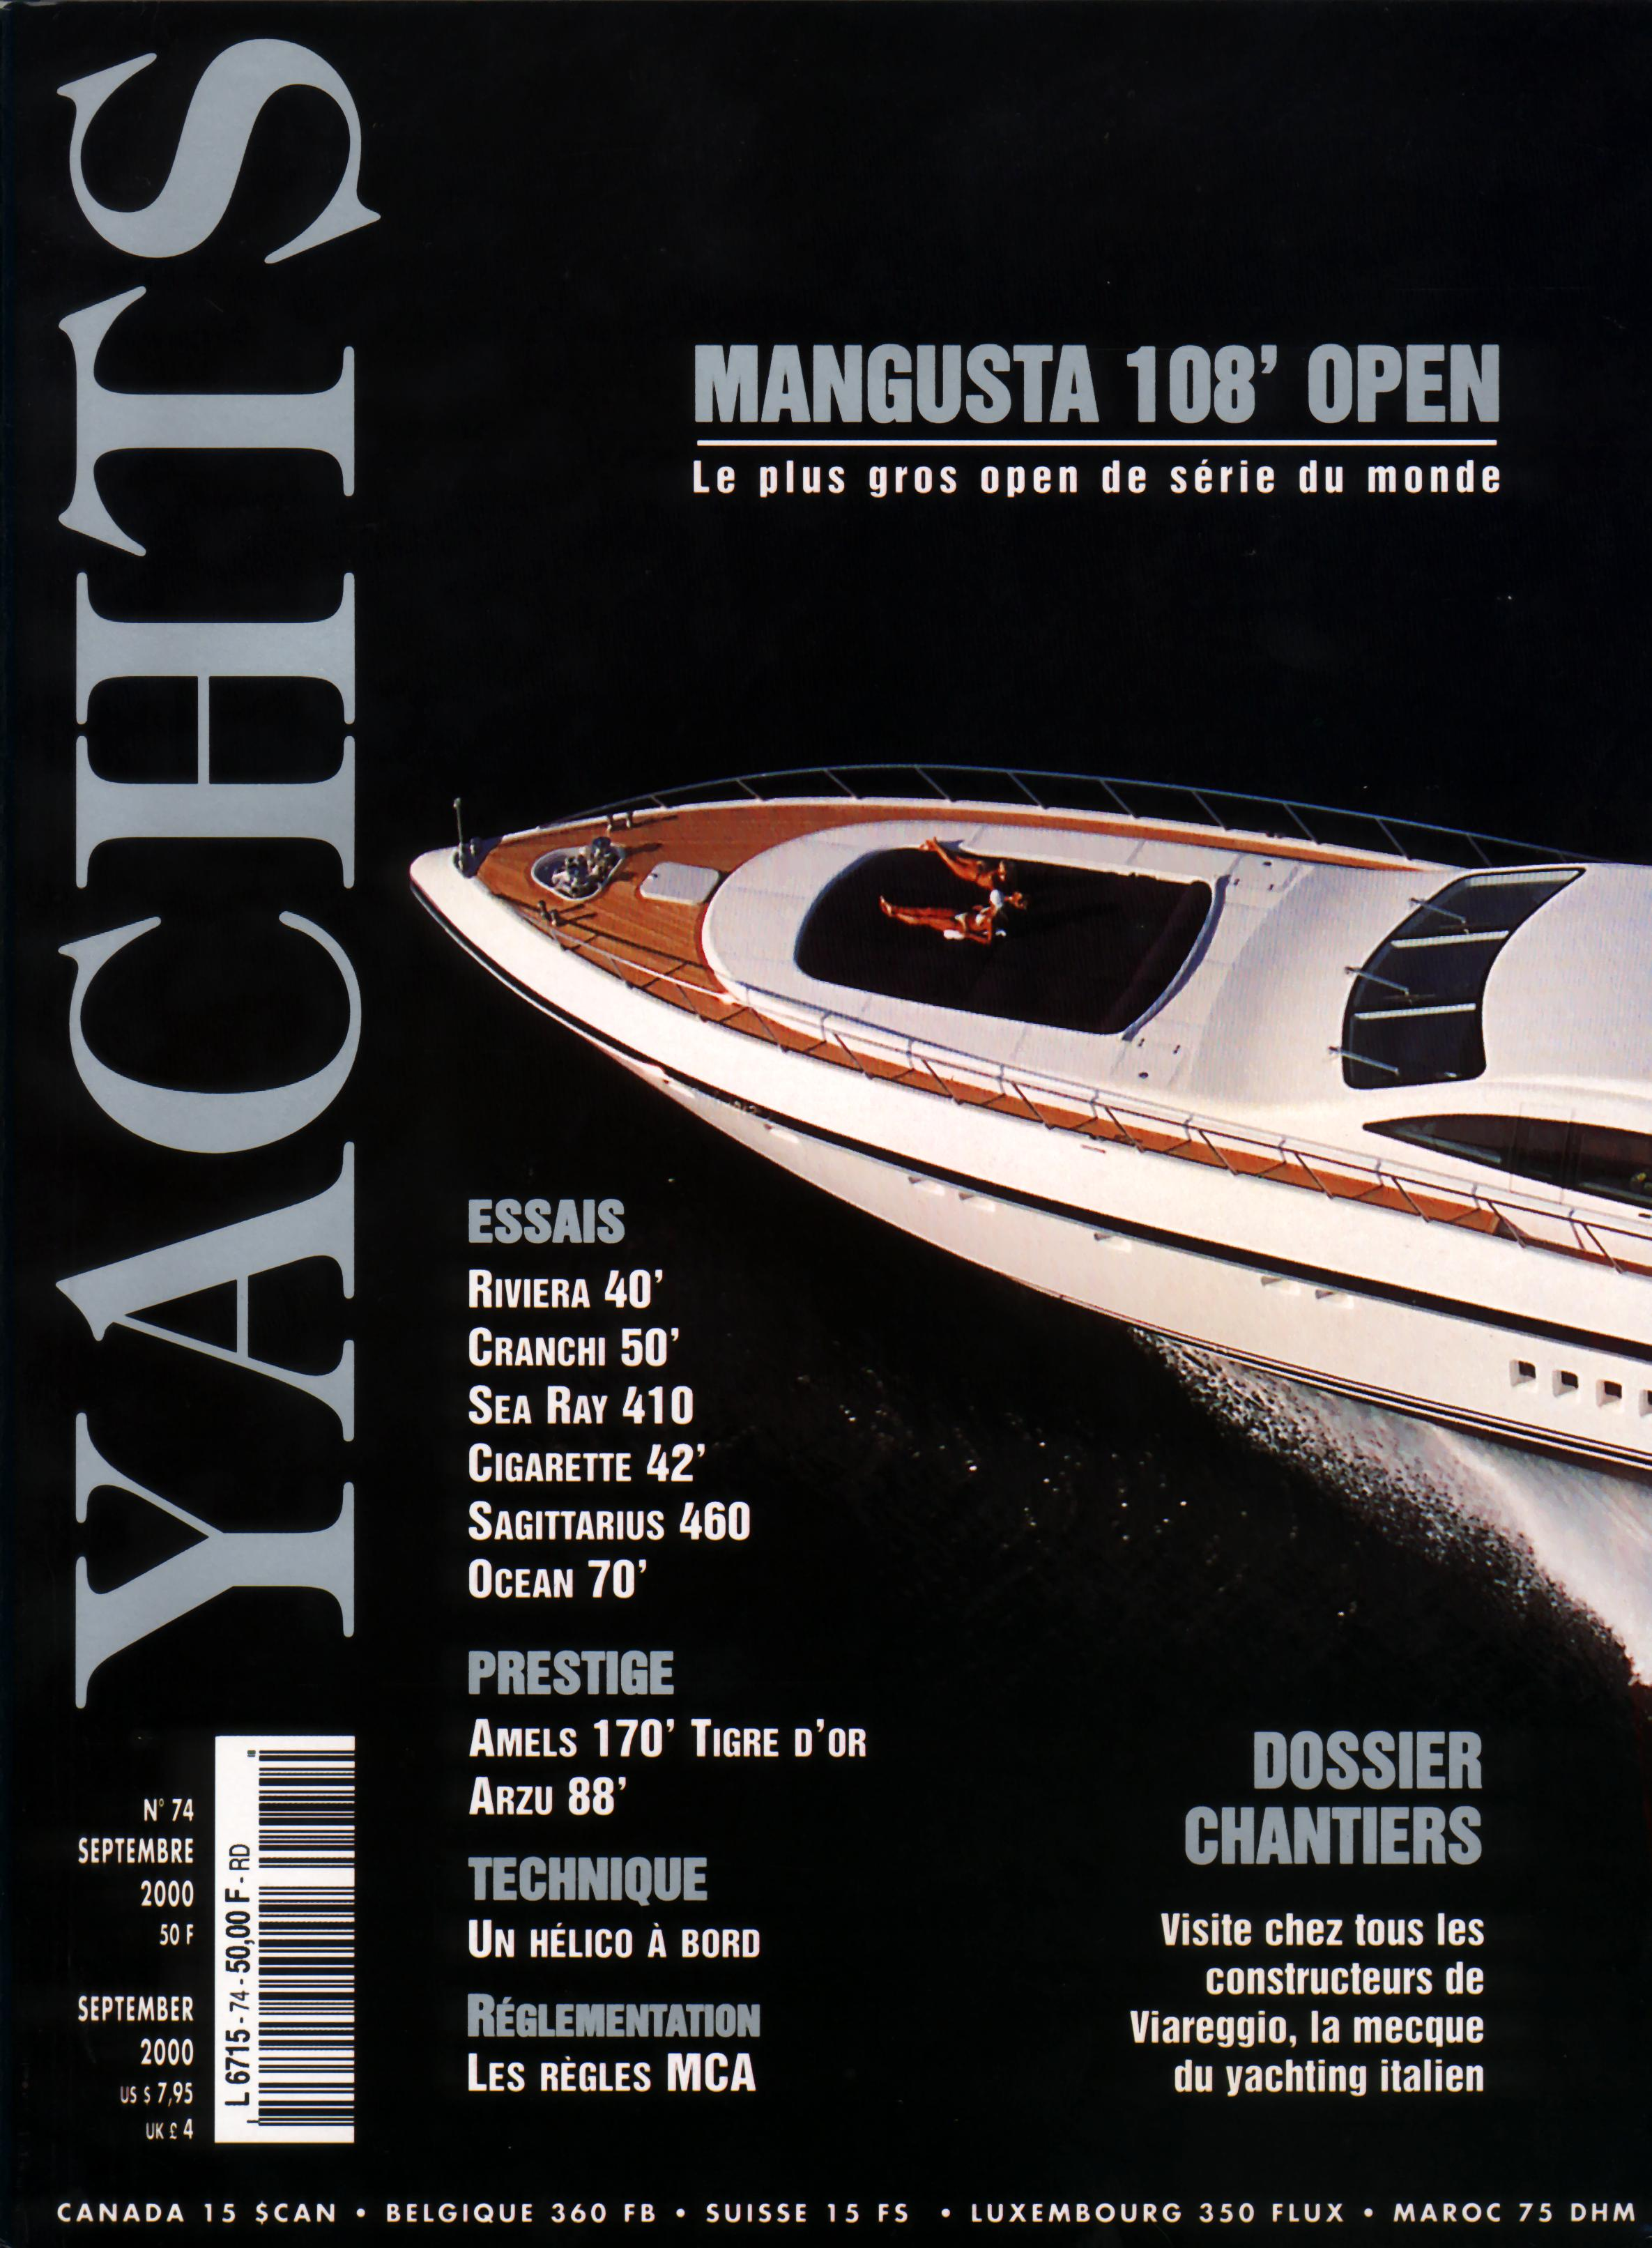 2000 Yachts Sept2000 - Couve.JPG